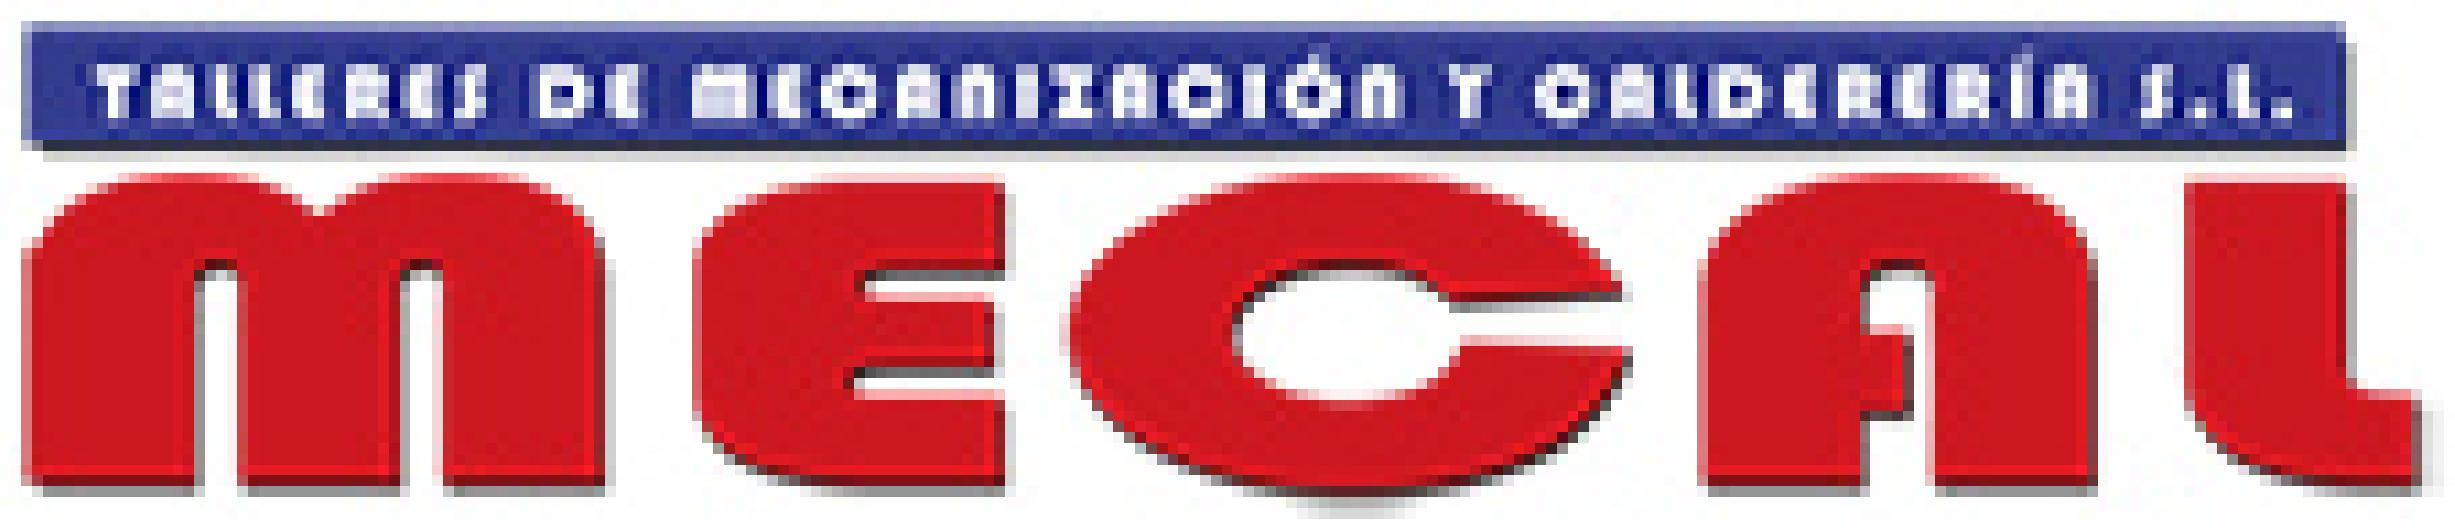 Logo MECAL Talleres de Mecanización y Calderería, S.L.